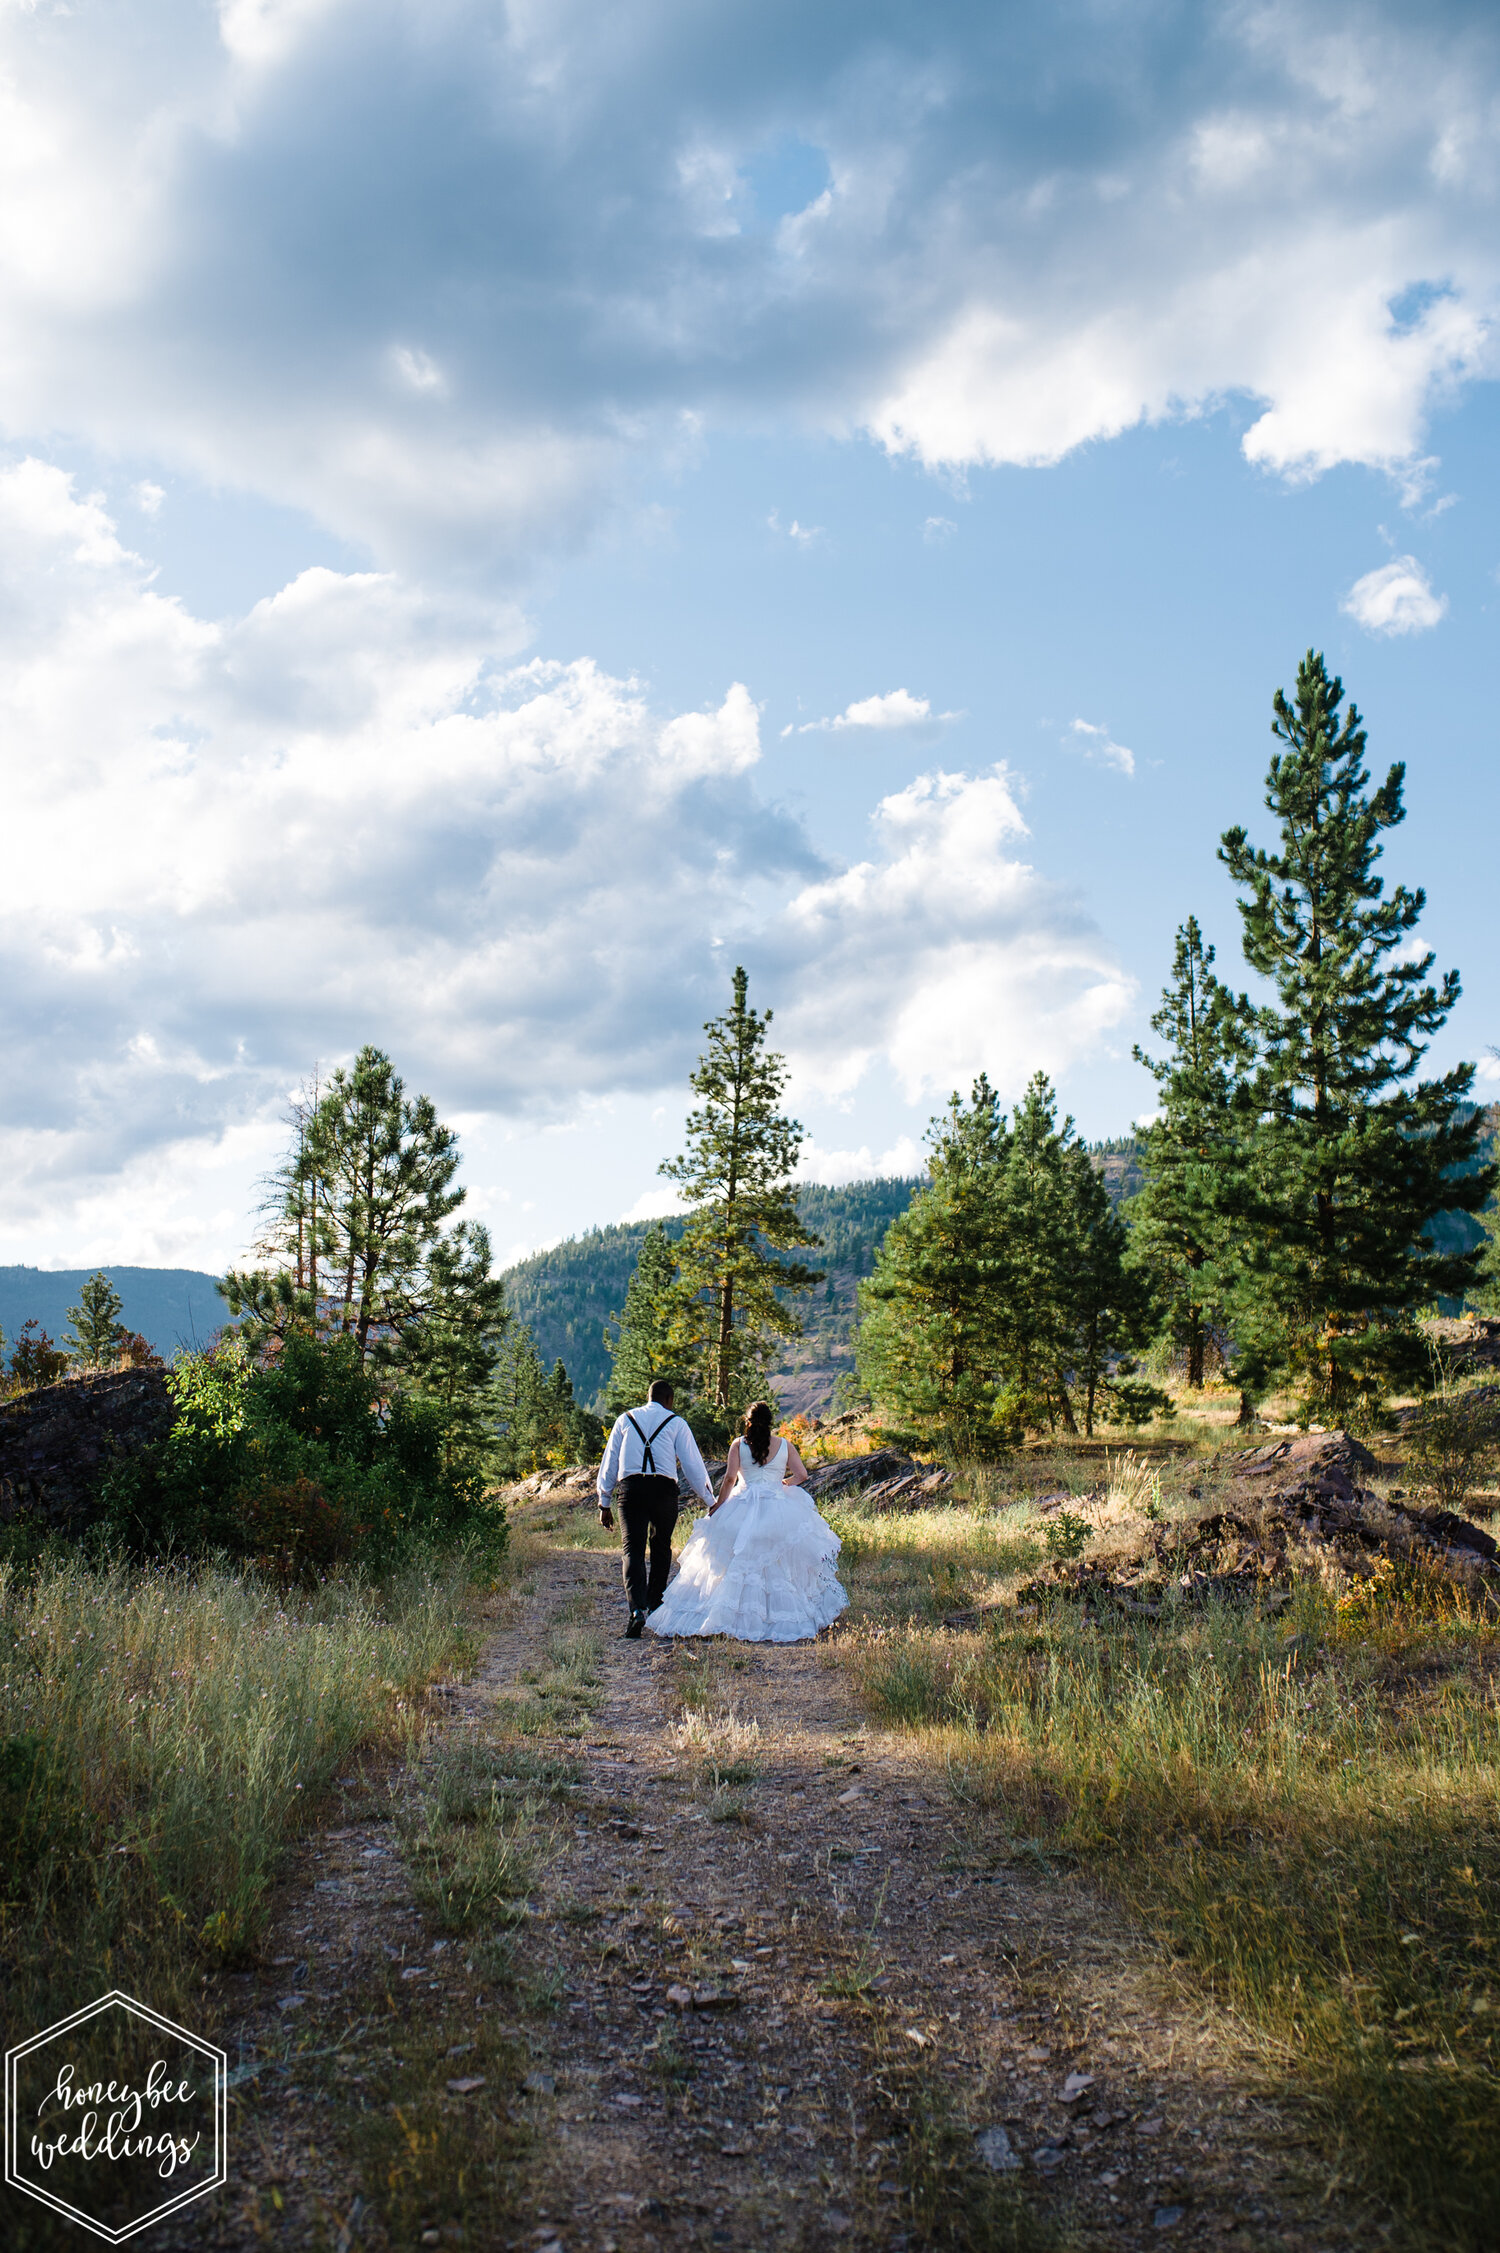 011White Raven Wedding_Montana Wedding Photographer_Rebekah & Likom_July 27, 2019-7.jpg